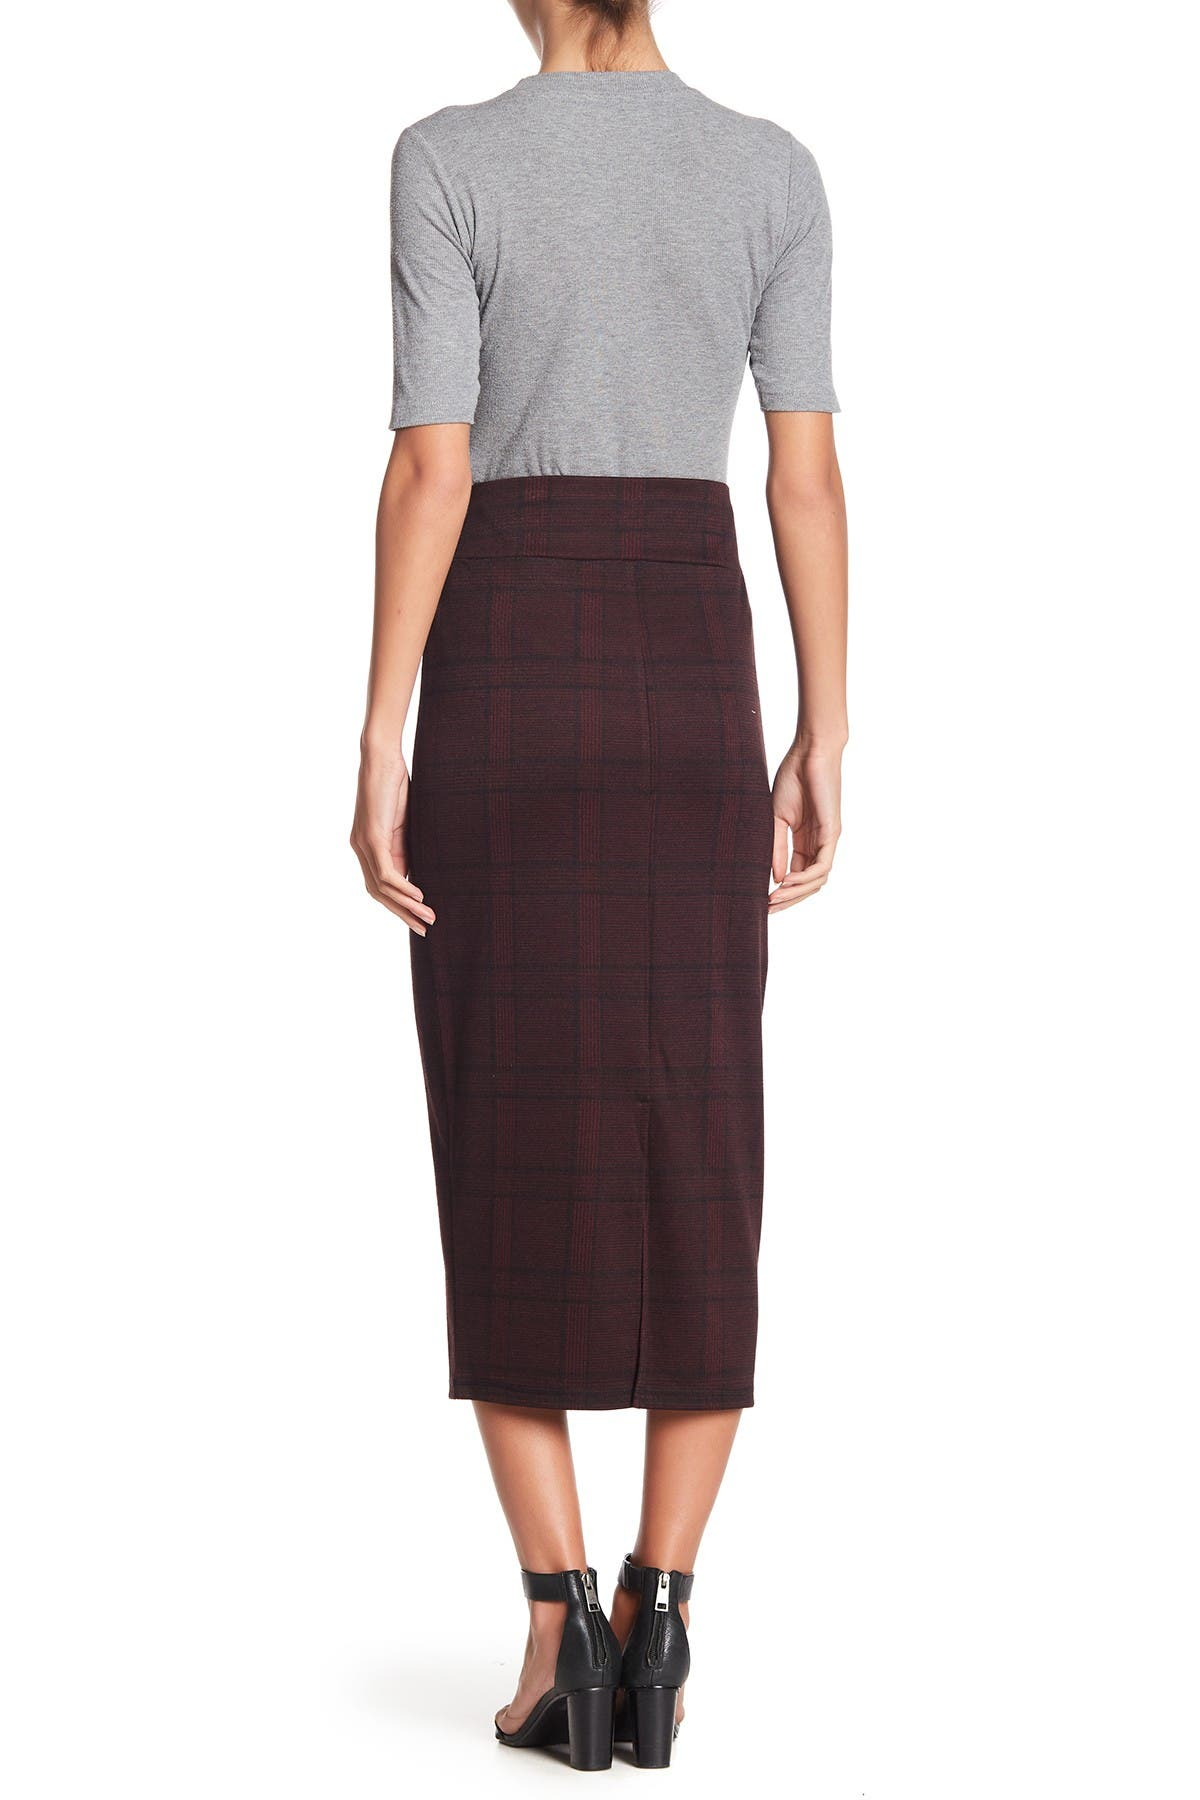 Image of 14th & Union Printed Pencil Midi Skirt